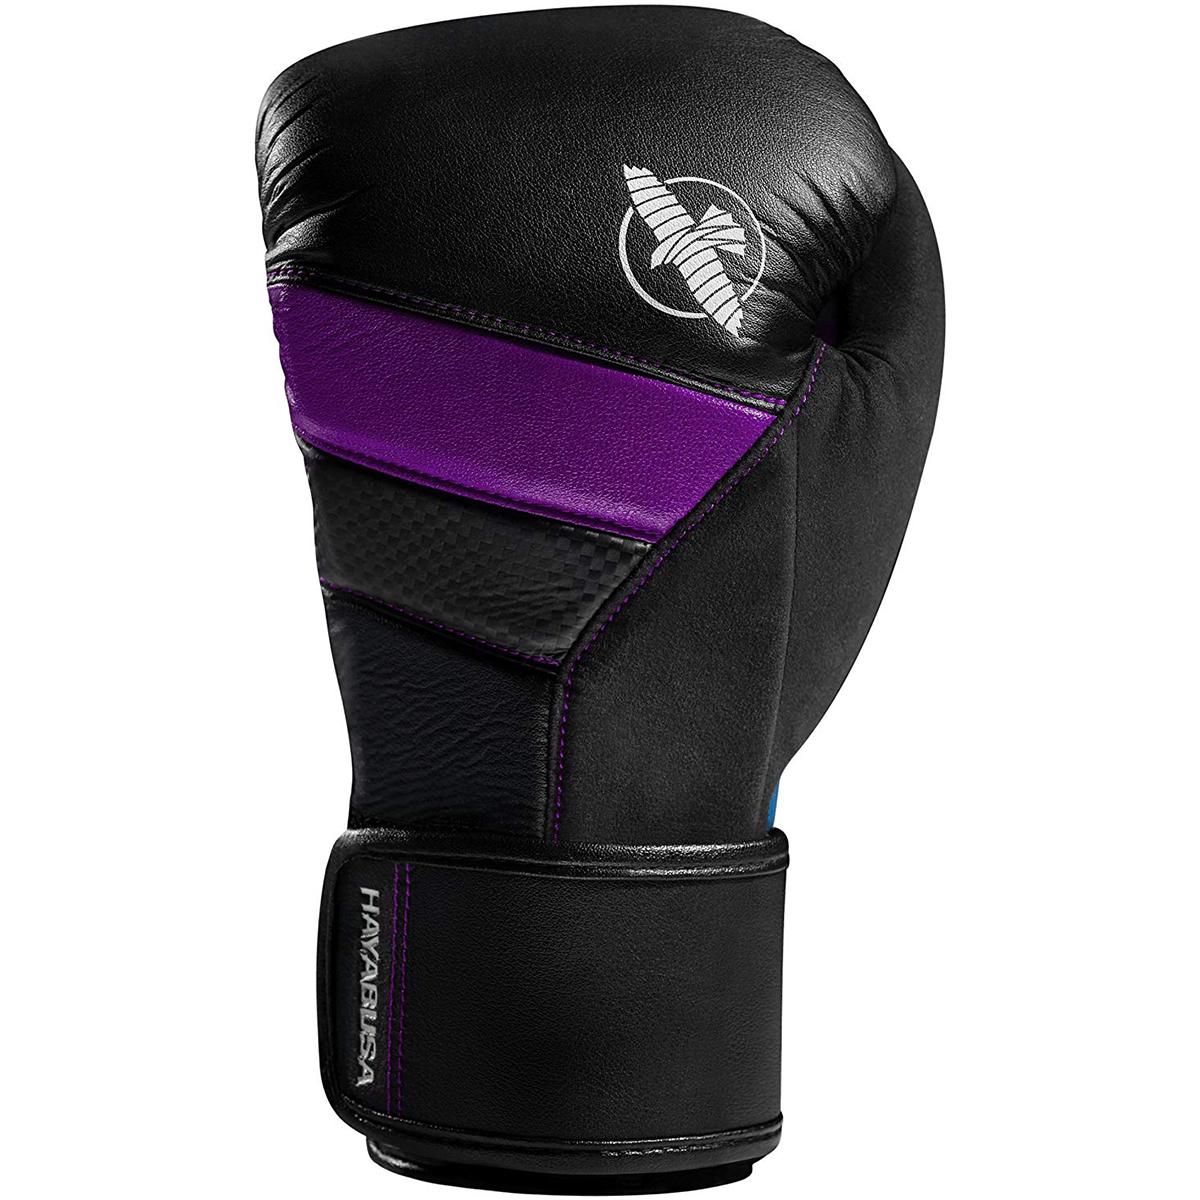 Hayabusa-T3-Dual-X-Hook-and-Loop-Closure-Vylar-Leather-Training-Boxing-Gloves thumbnail 16